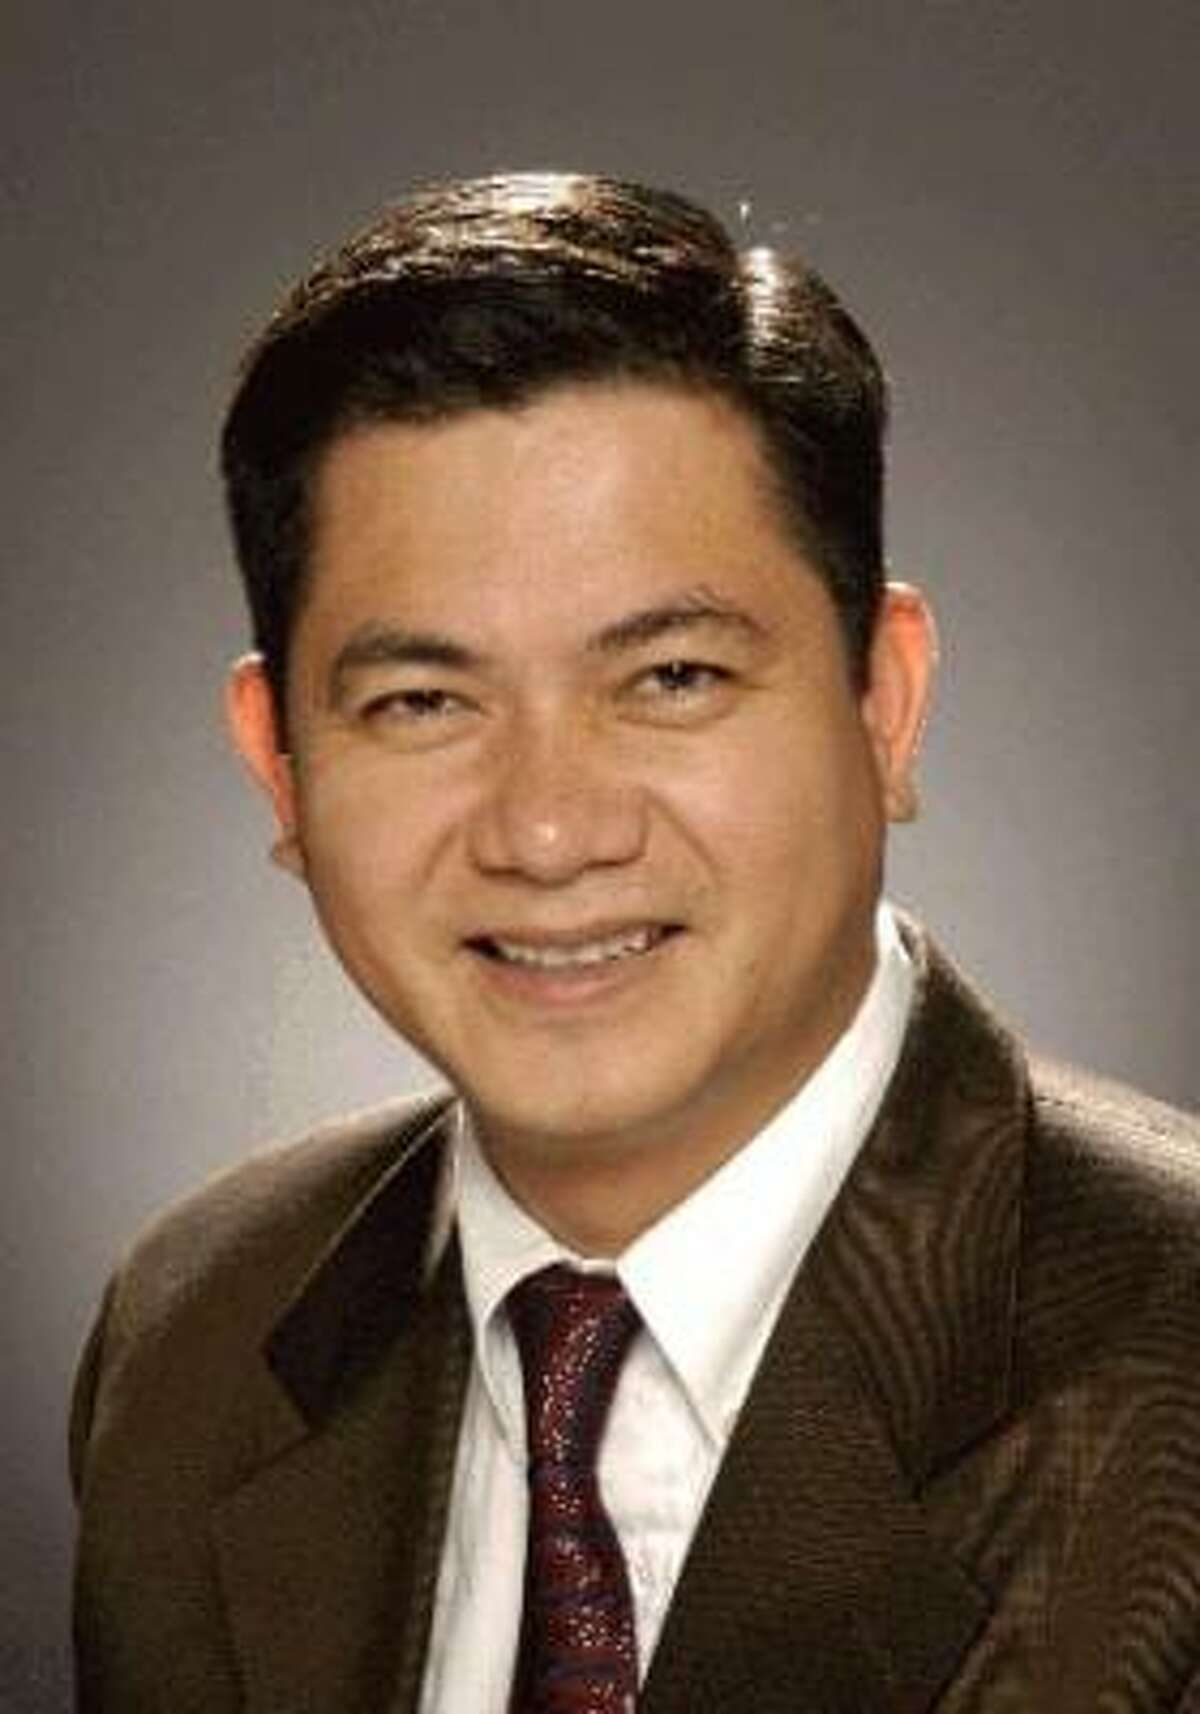 City Council District F candidate Al Hoang